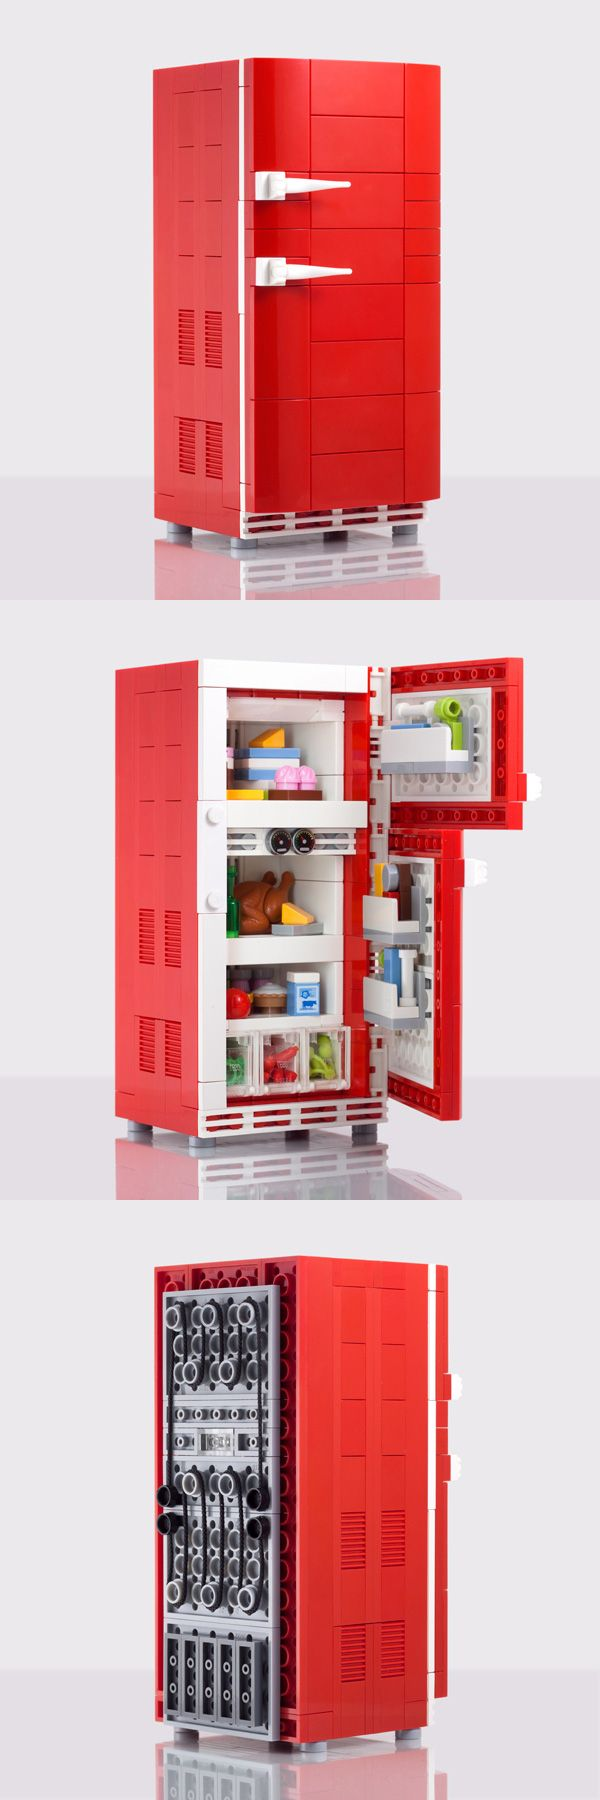 retro refrigerator custom lego kit by chris mcveigh